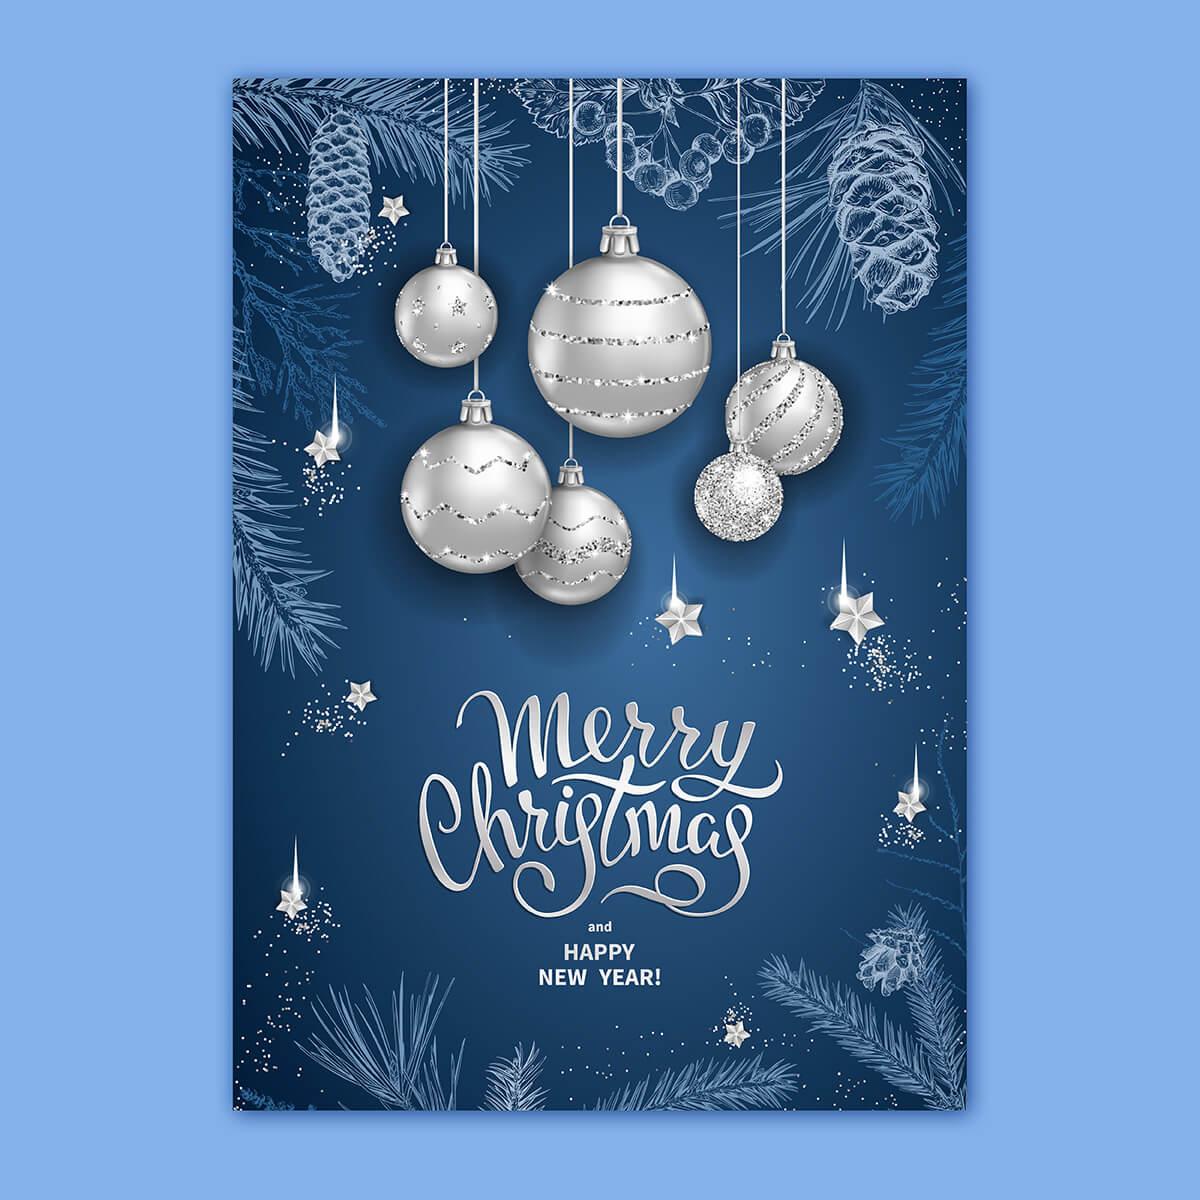 Foiled Christmas Cards